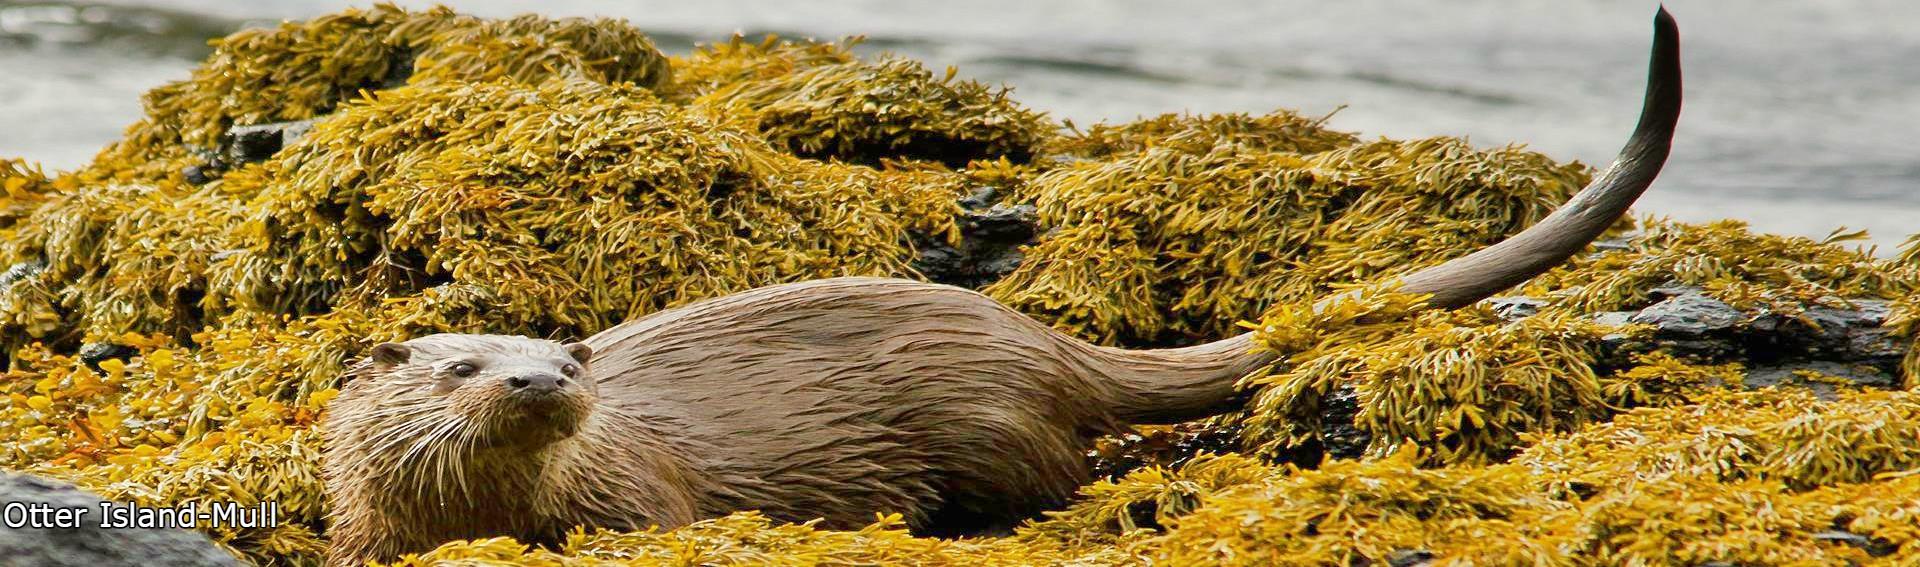 Otter,Isle of Mull